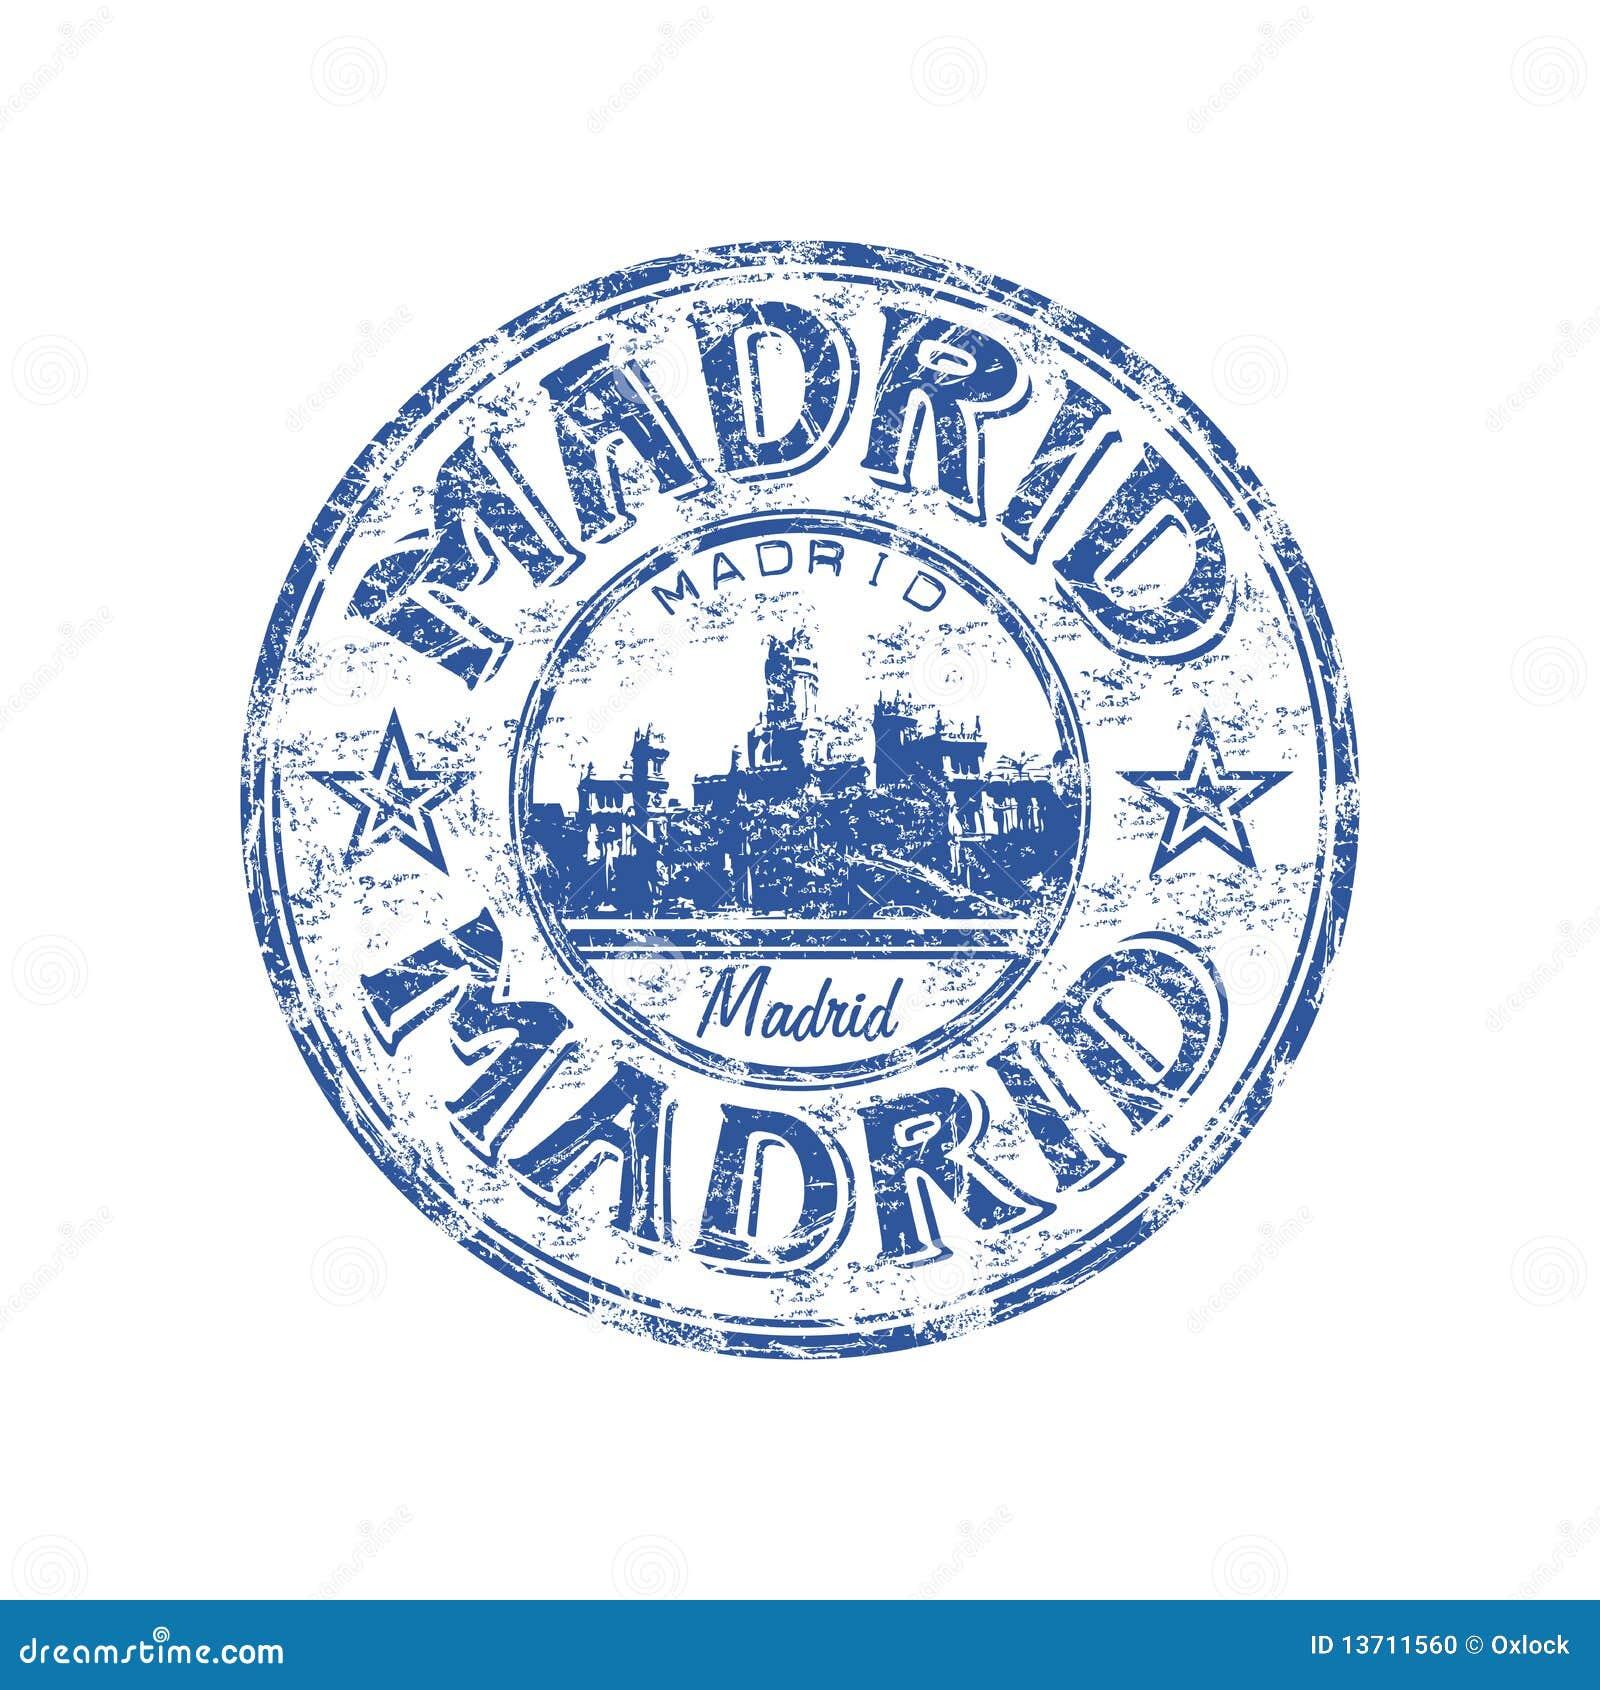 Madrid grunge rubber stamp